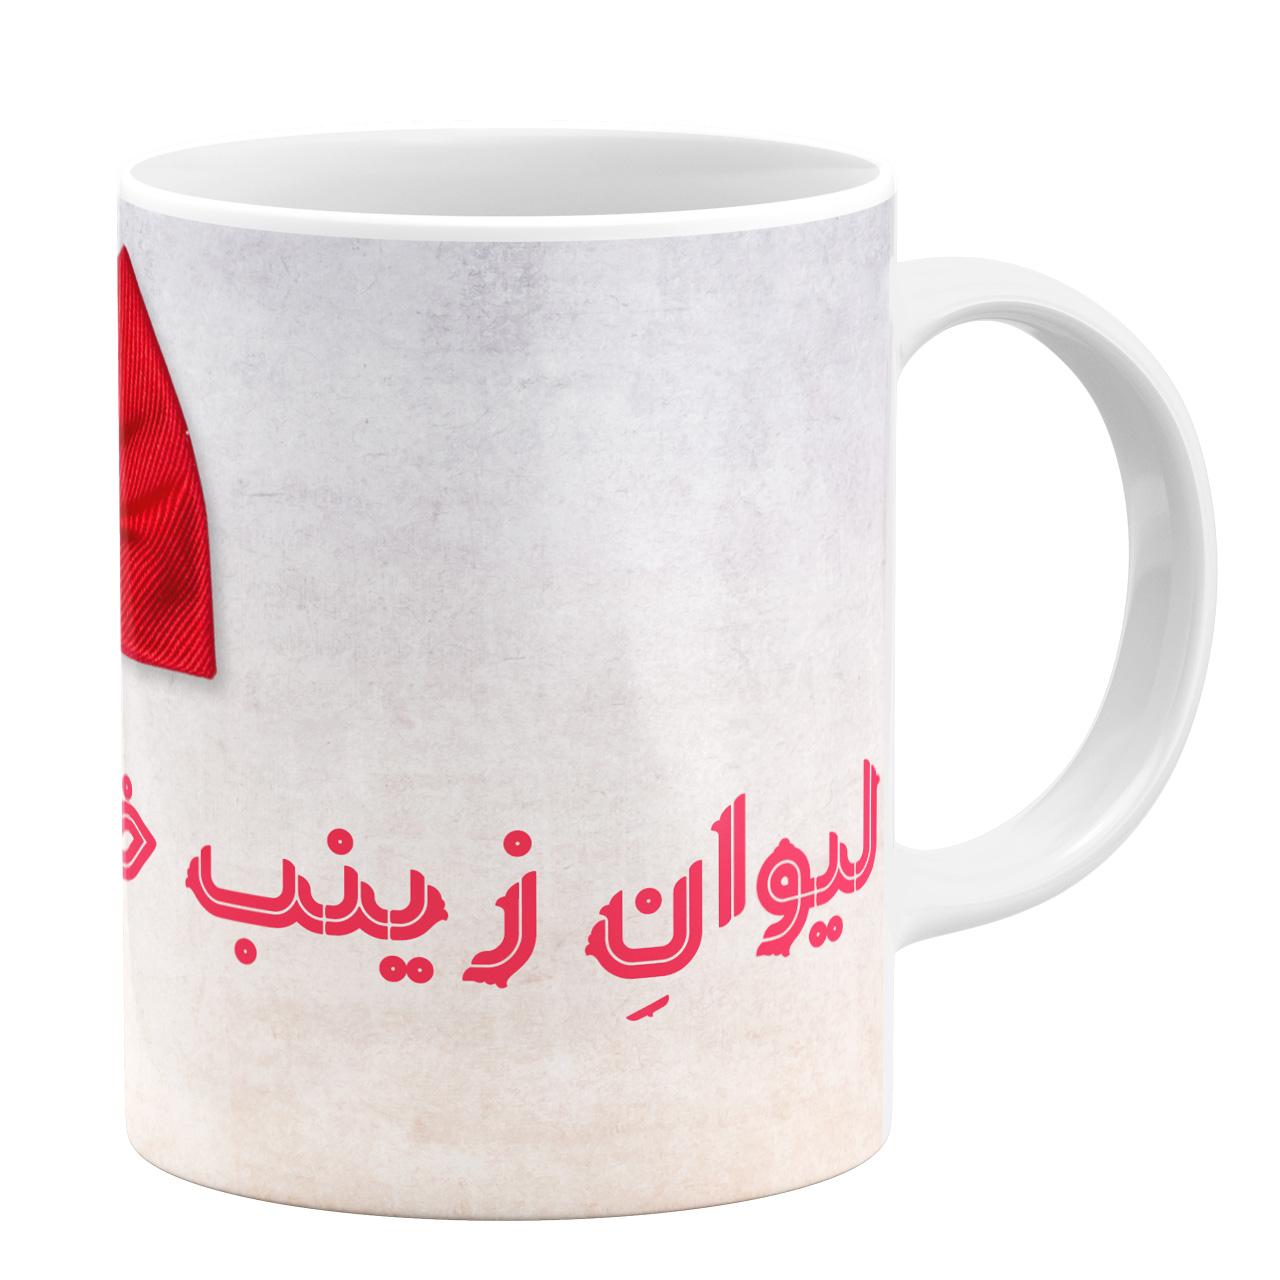 عکس ماگ طرح لیوان زینب خانم کد 110541094291